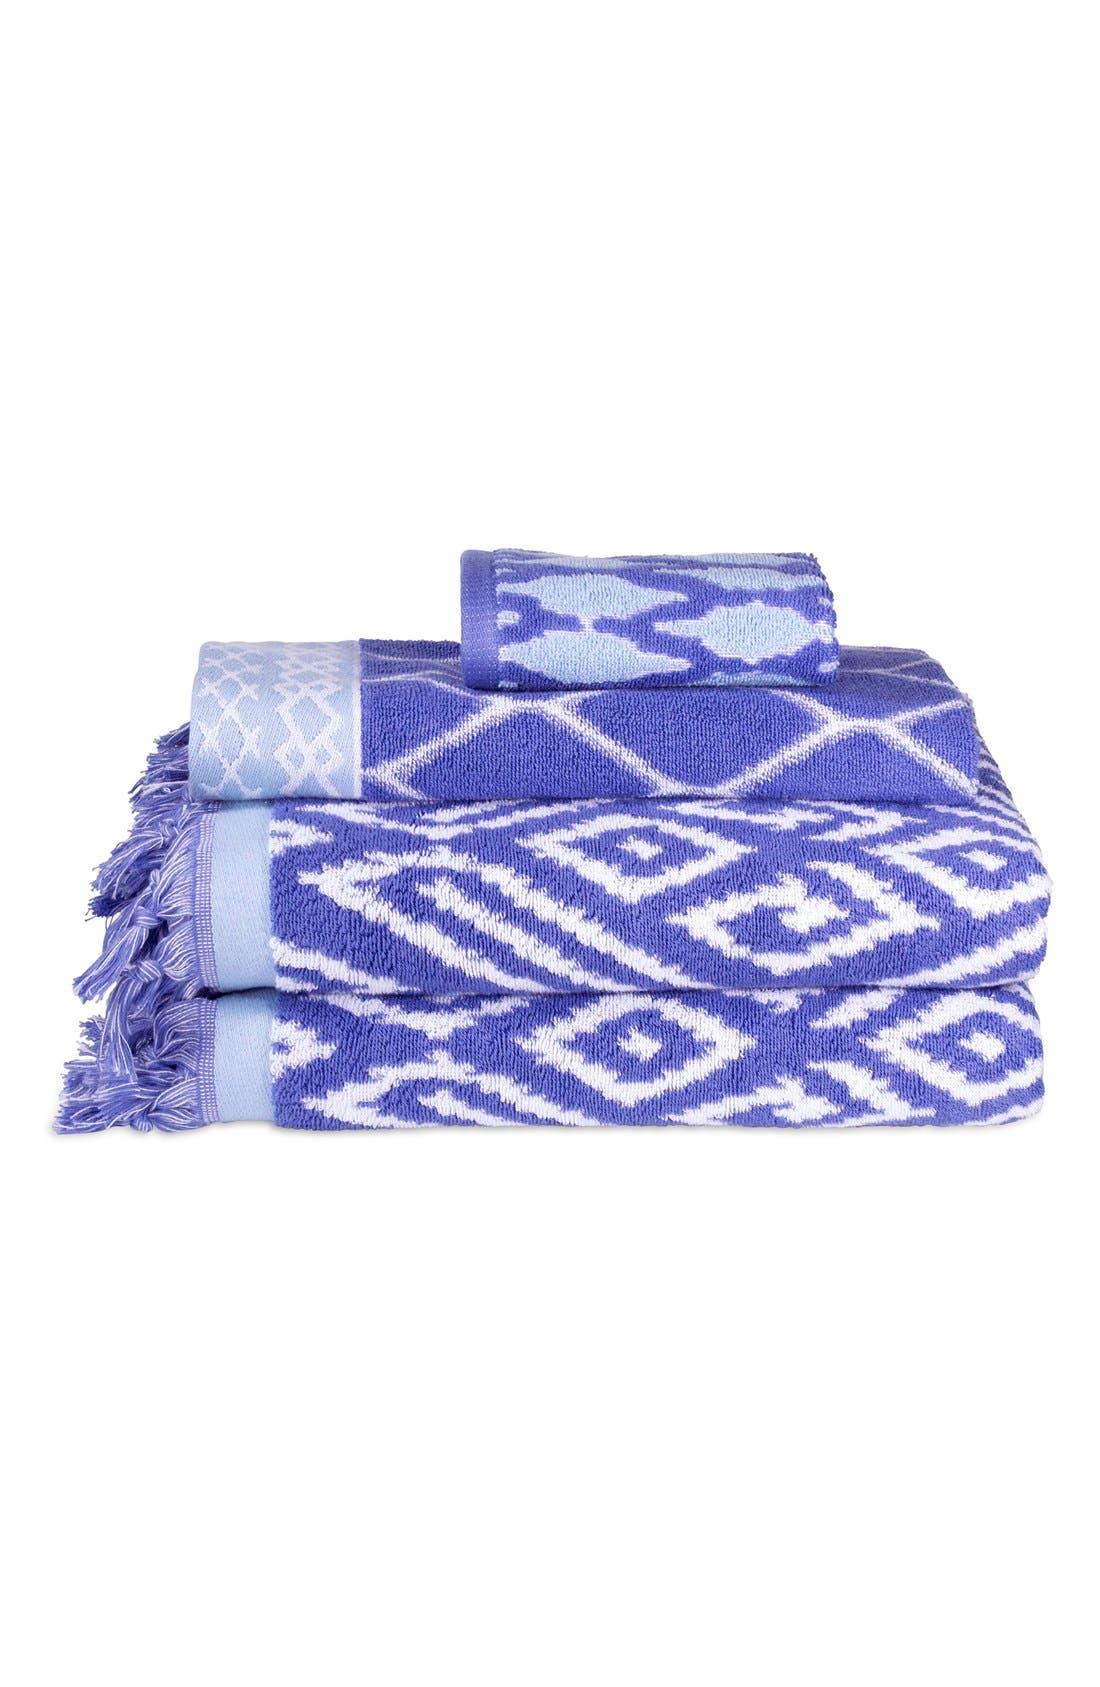 'Kalasin' Turkish Cotton Bath Towel,                             Main thumbnail 1, color,                             430